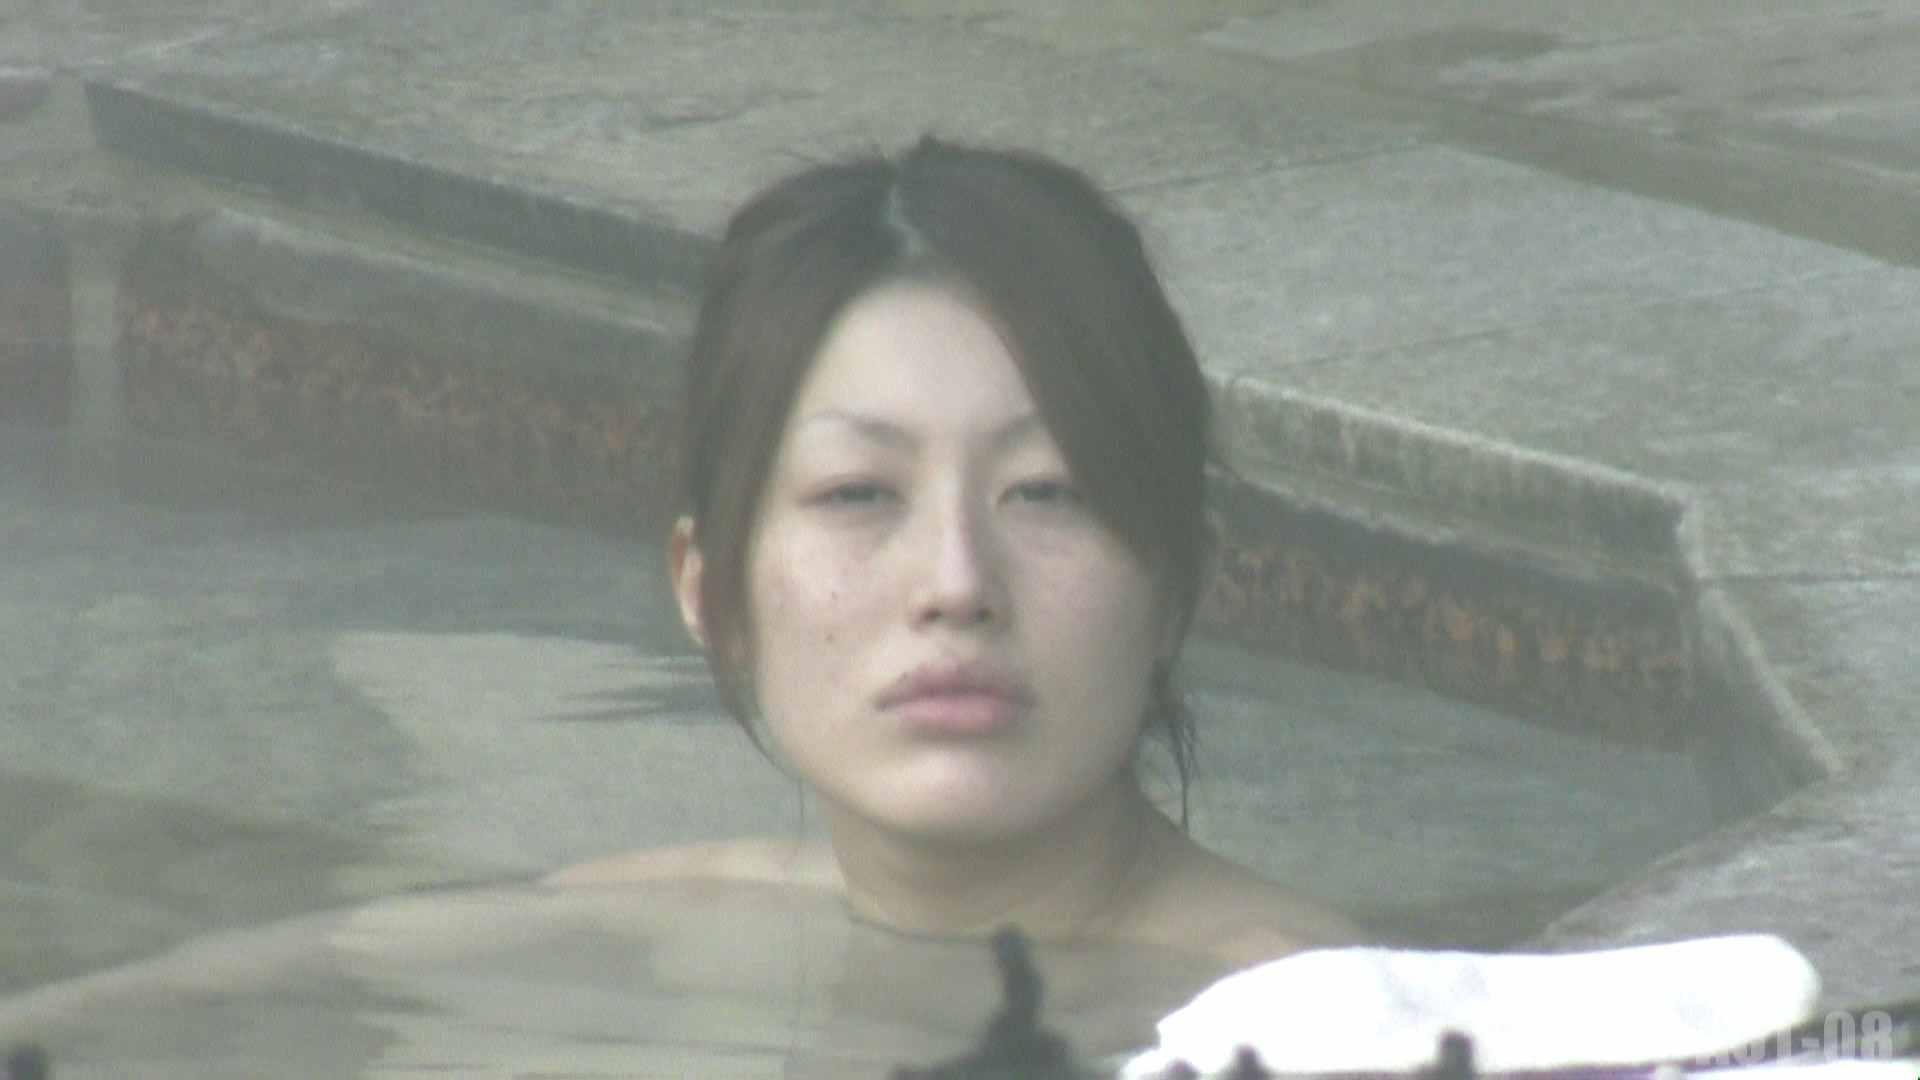 Aquaな露天風呂Vol.775 盗撮映像  74Pix 39